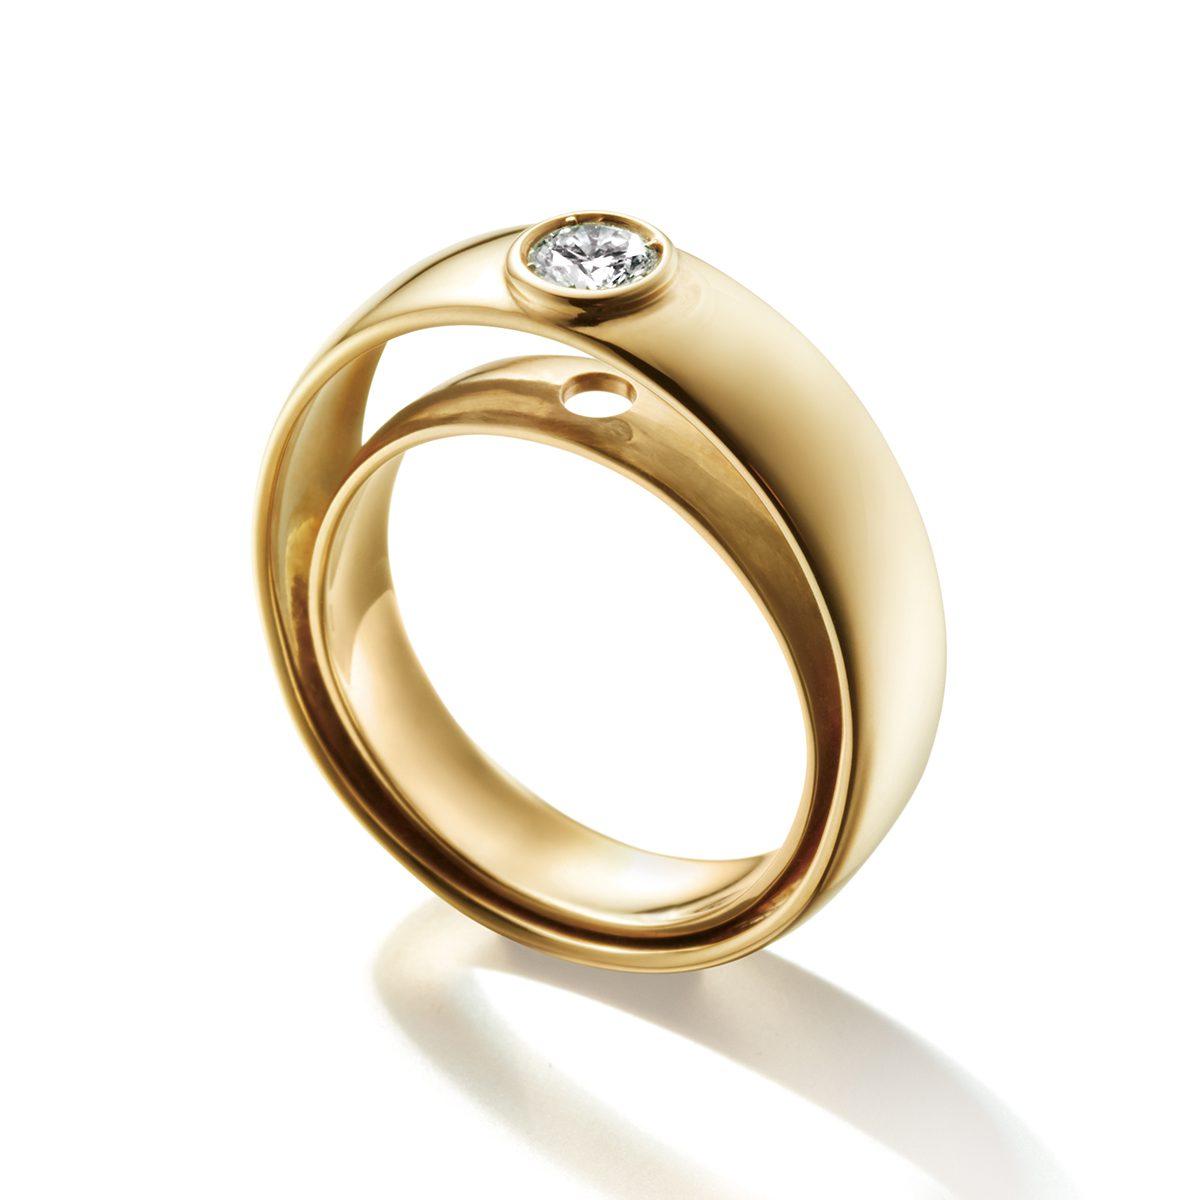 LIA DI GREGORIO SOFT MOVE|Engagement Rings